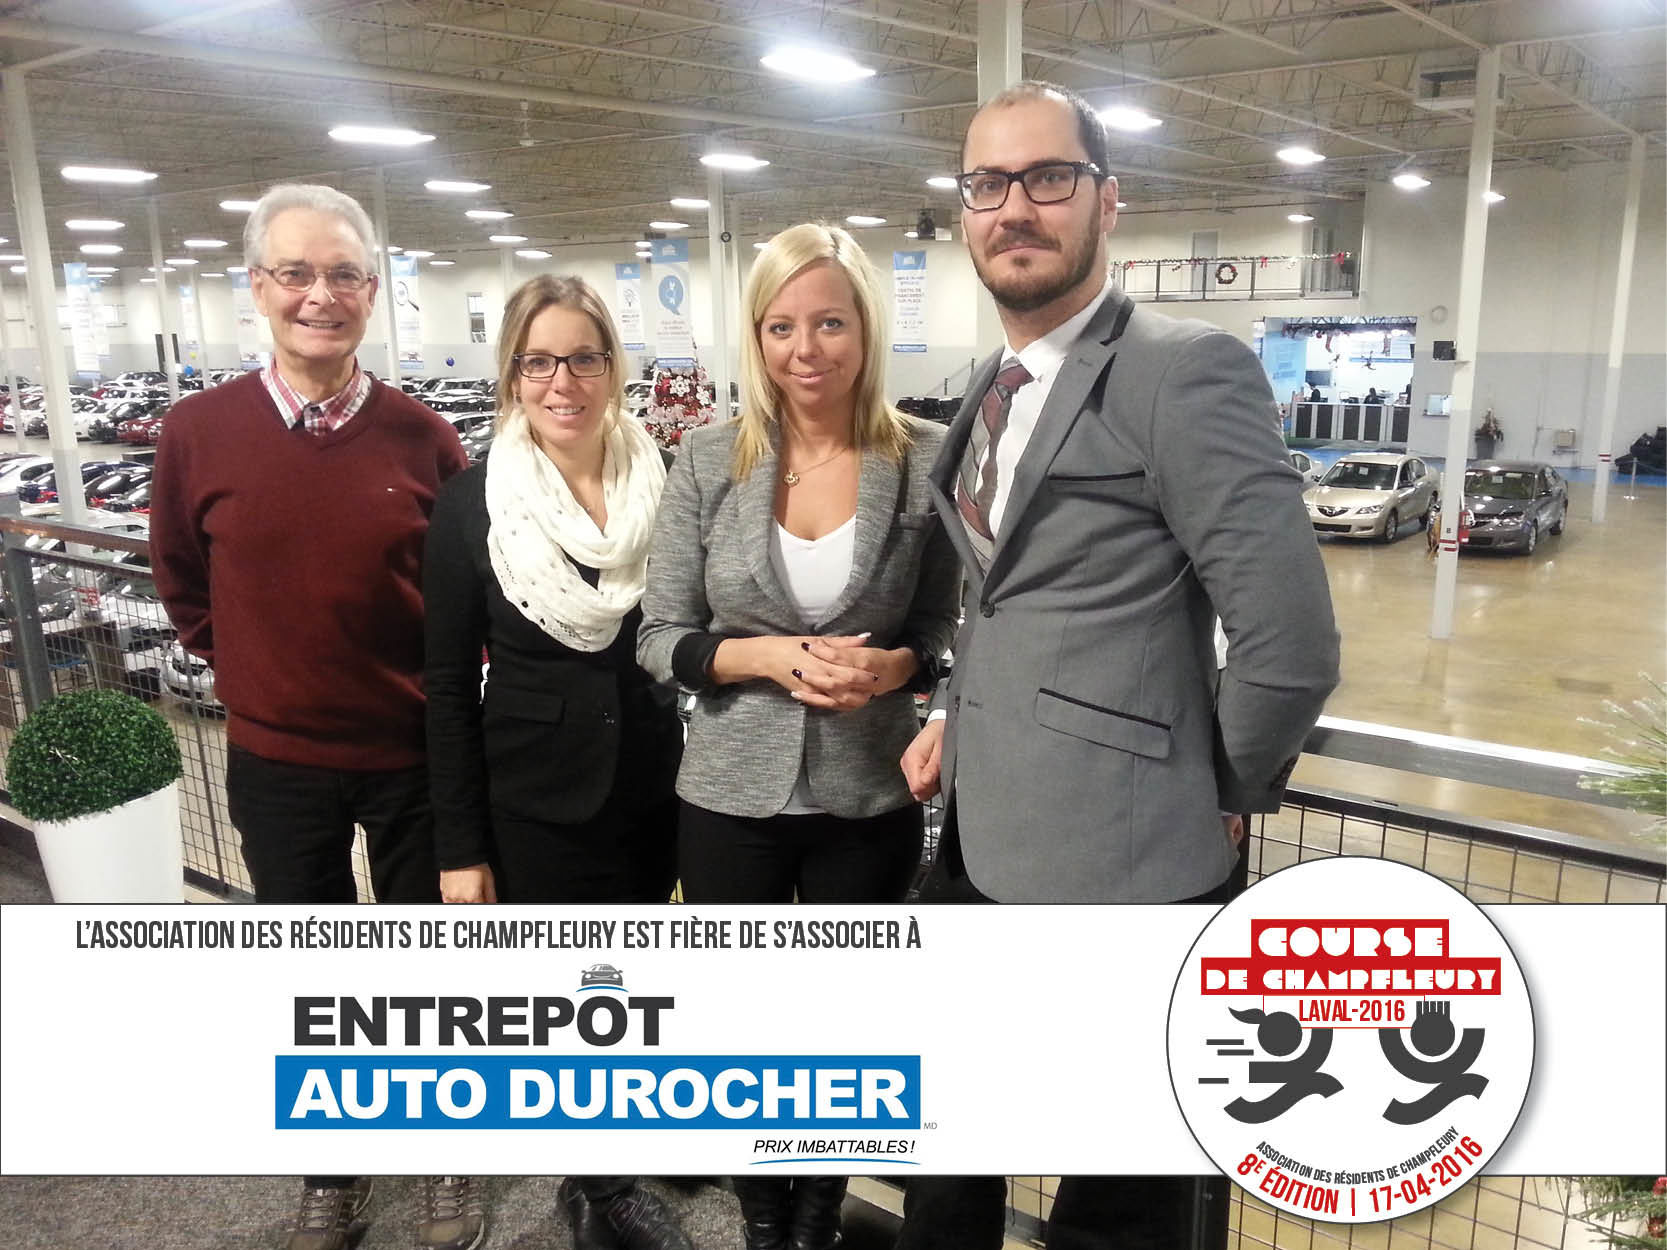 Entrepot Auto Durocher >> Our Commitment Entrepot Auto Durocher In Laval Quebec